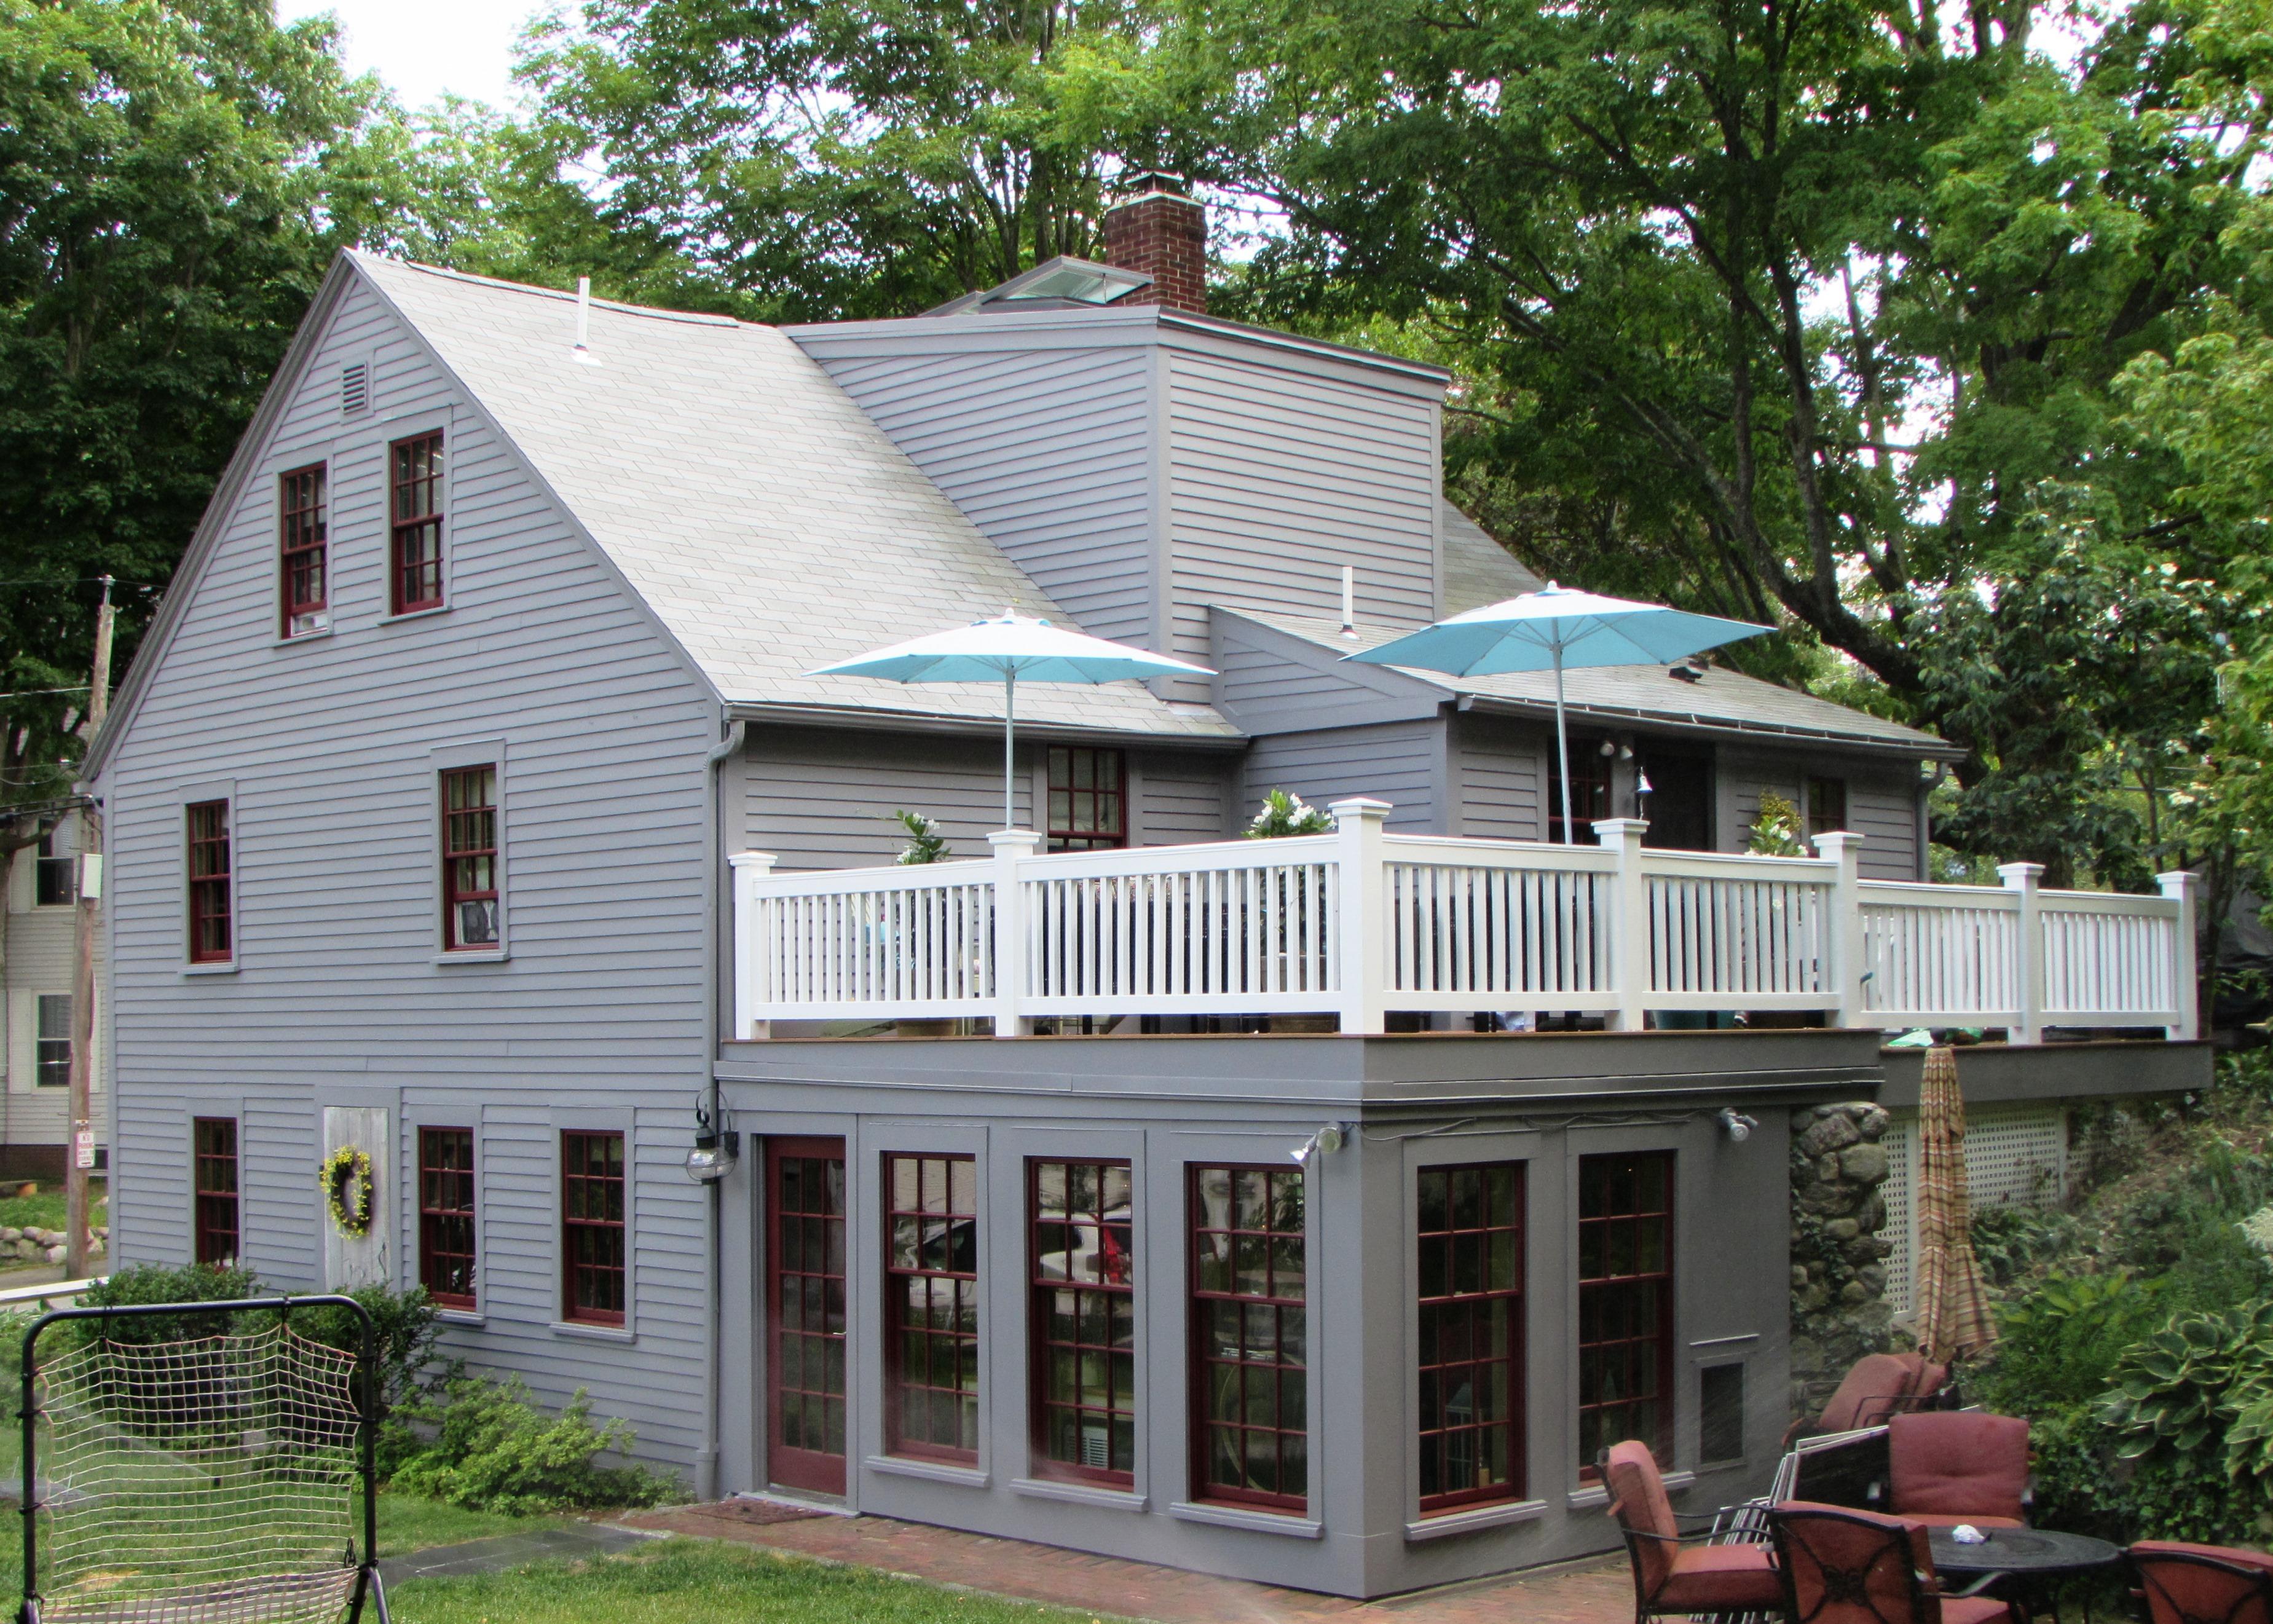 Exterior repairs quality exterior repairs in massachusetts call joe for 30 for Exterior house repair